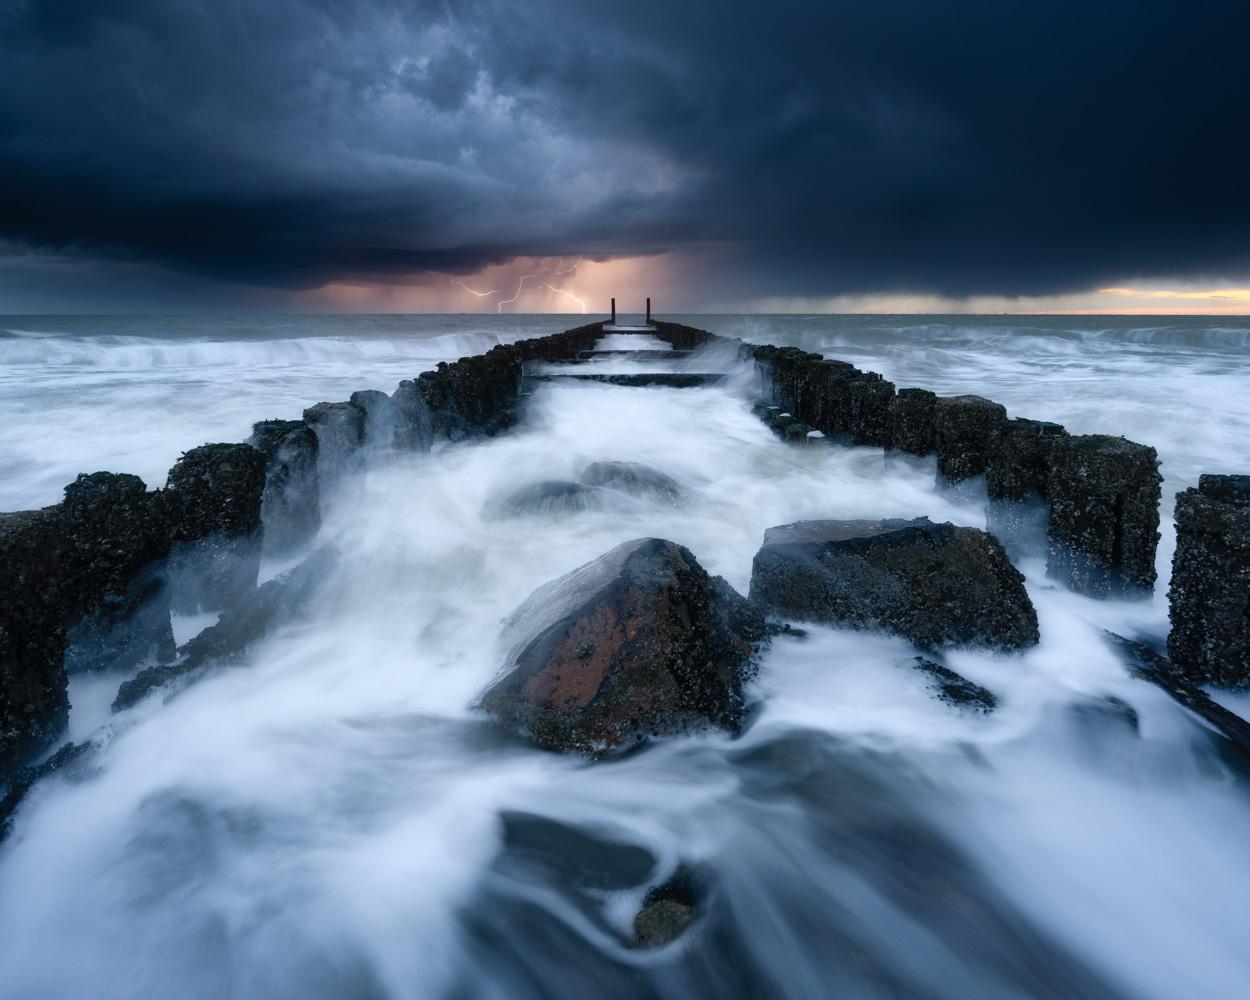 Lightning by Ellen van den Doel